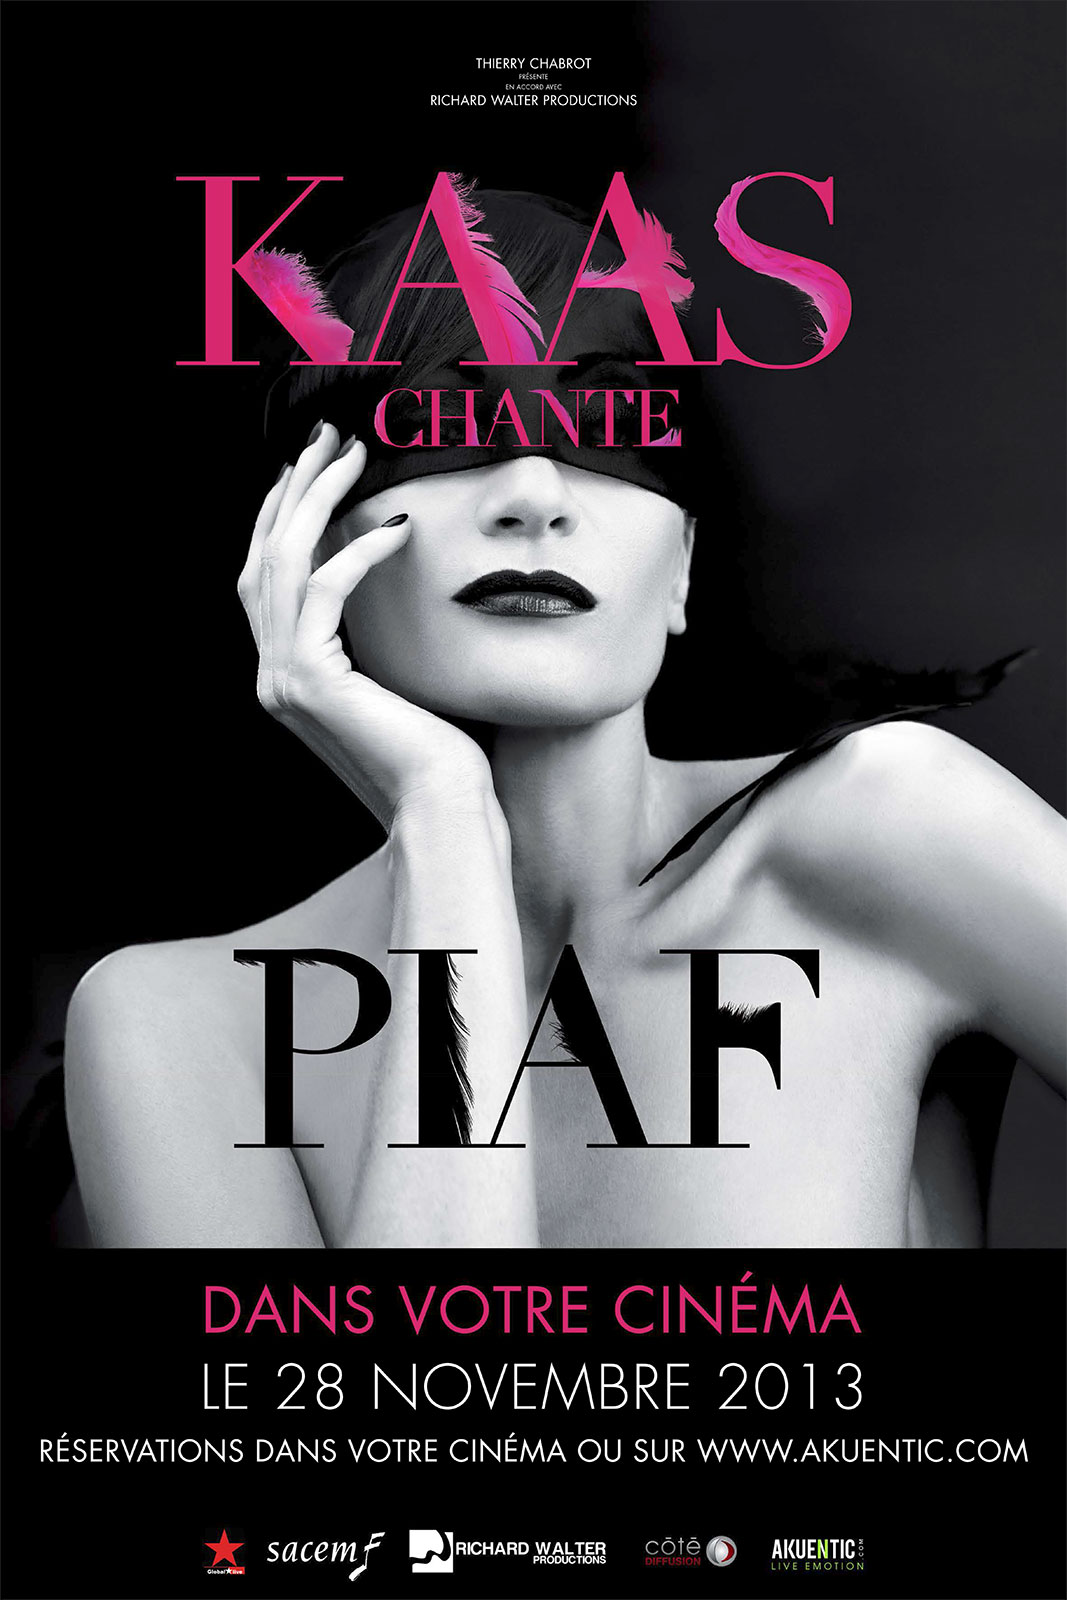 Télécharger Patricia Kaas chante Piaf VF Complet Uploaded